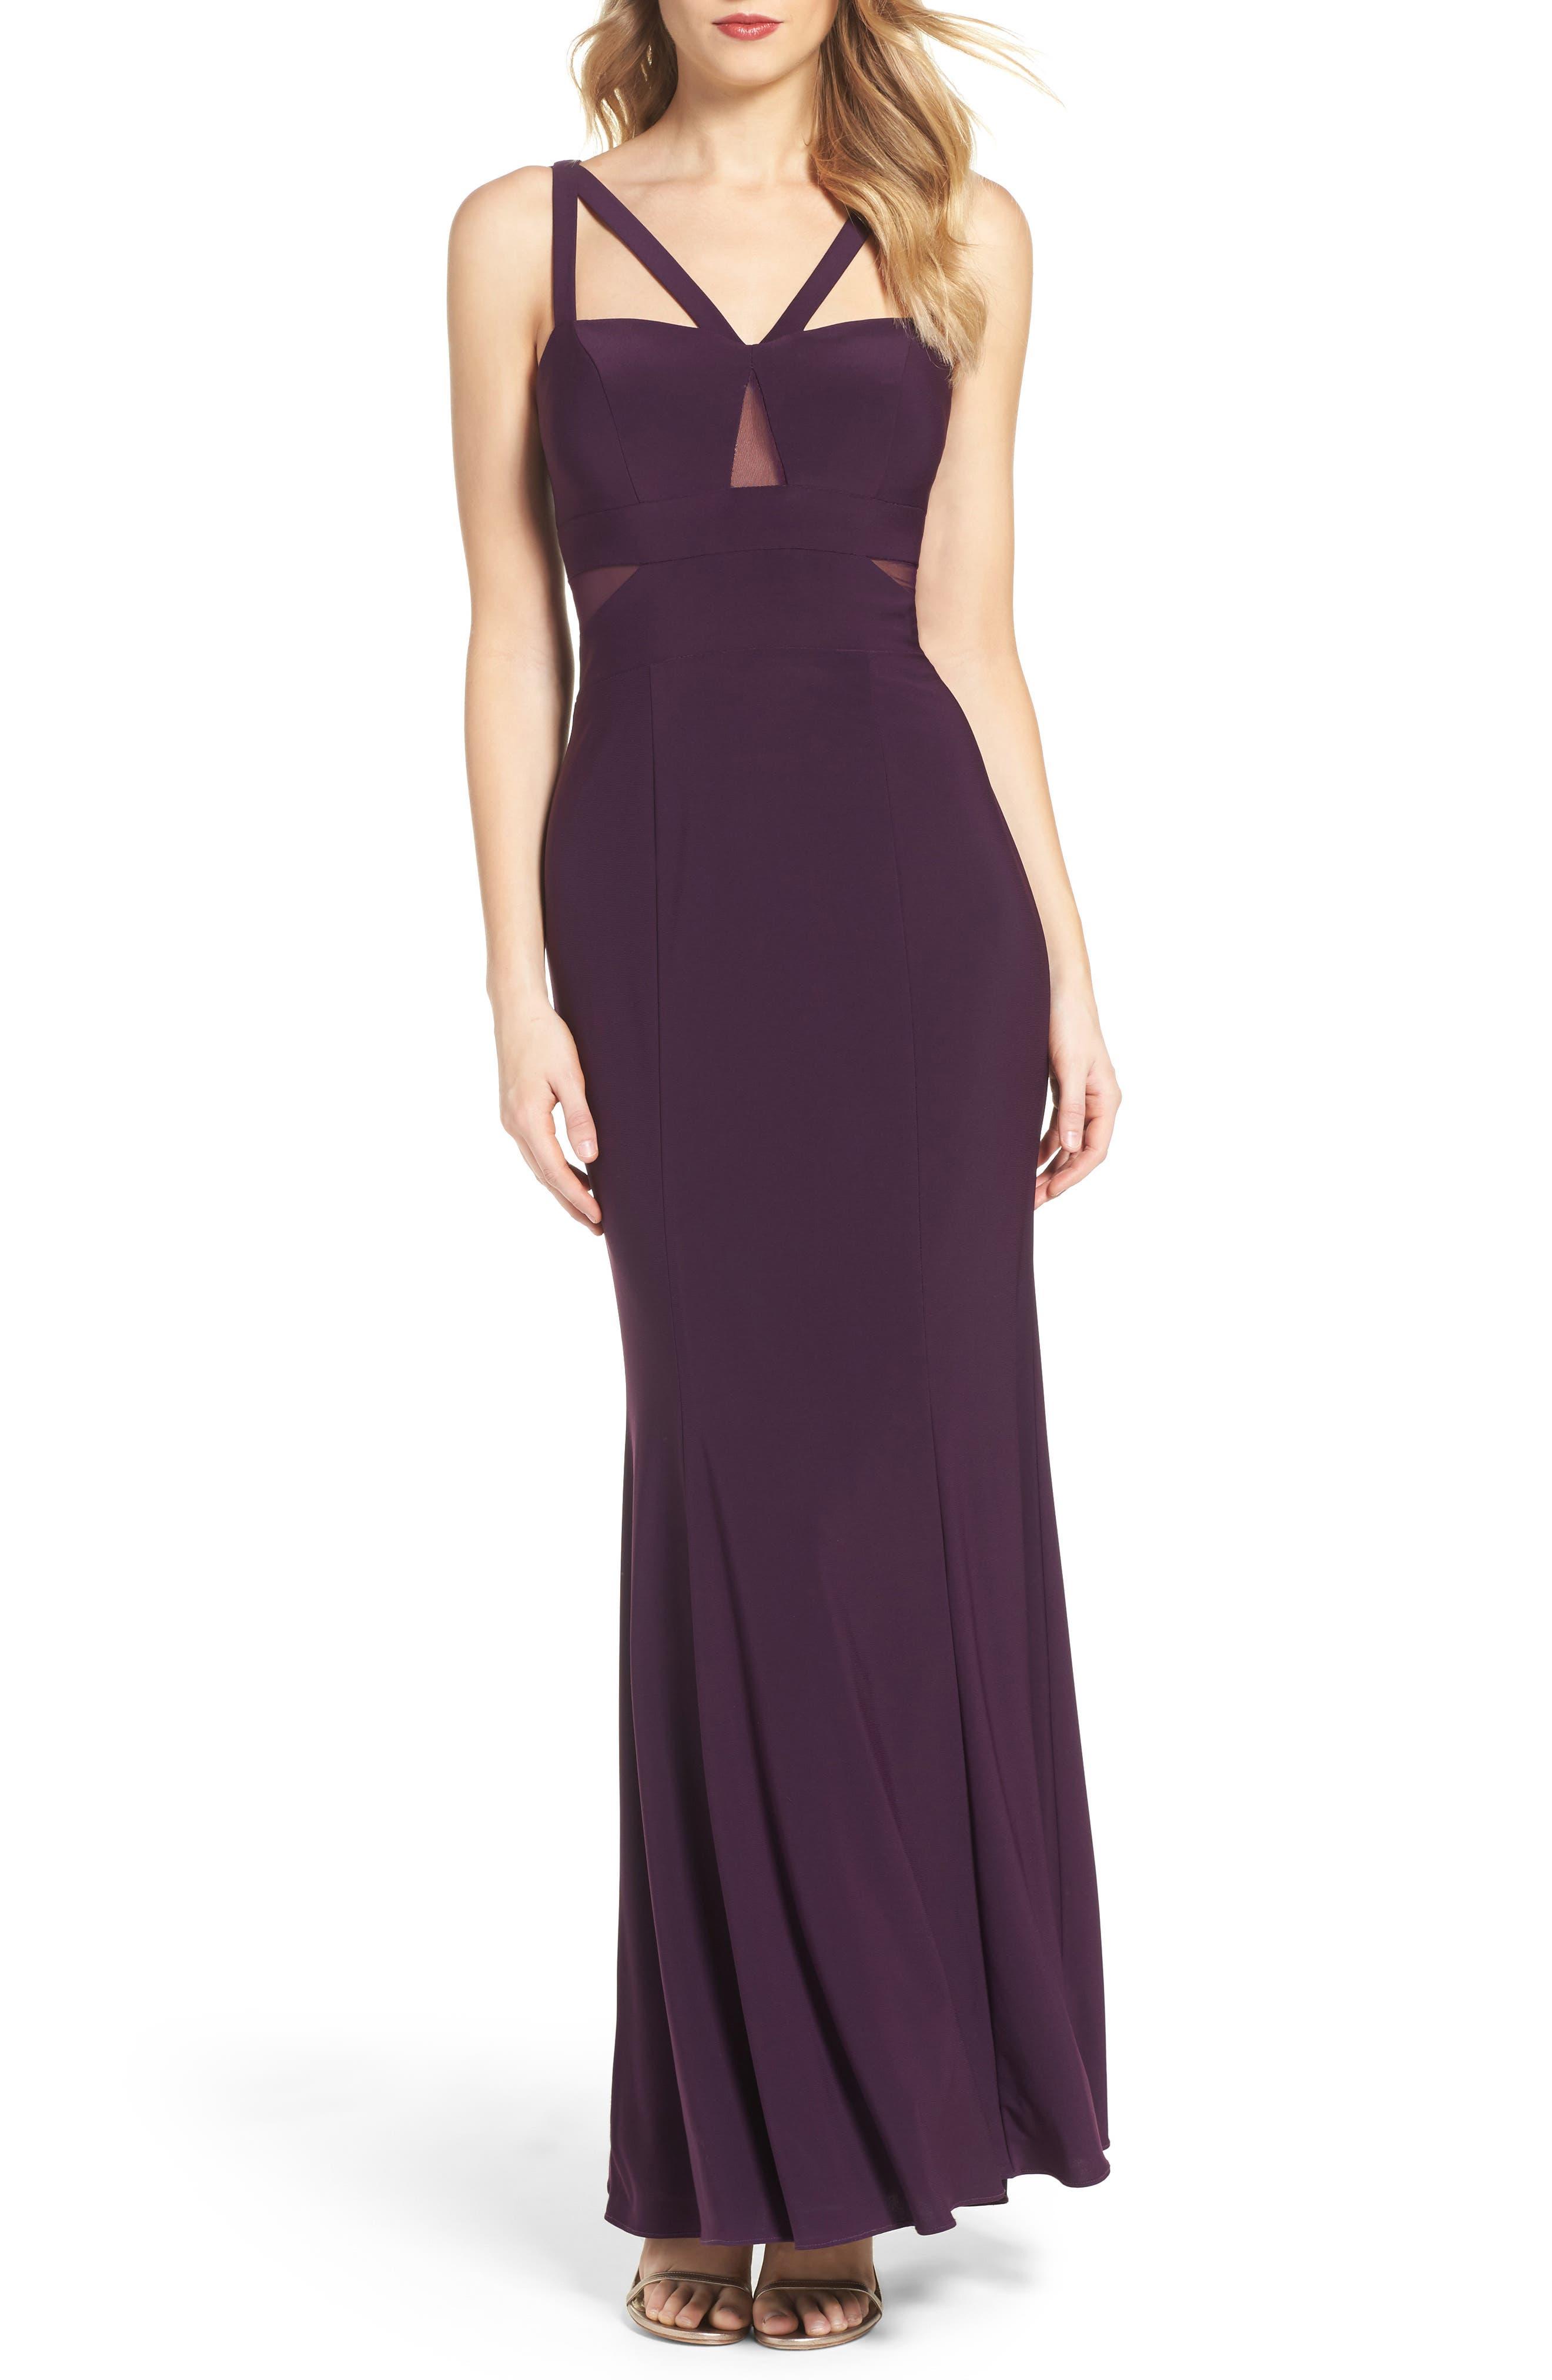 Main Image - Xscape Illusion Inset Gown (Regular & Petite)